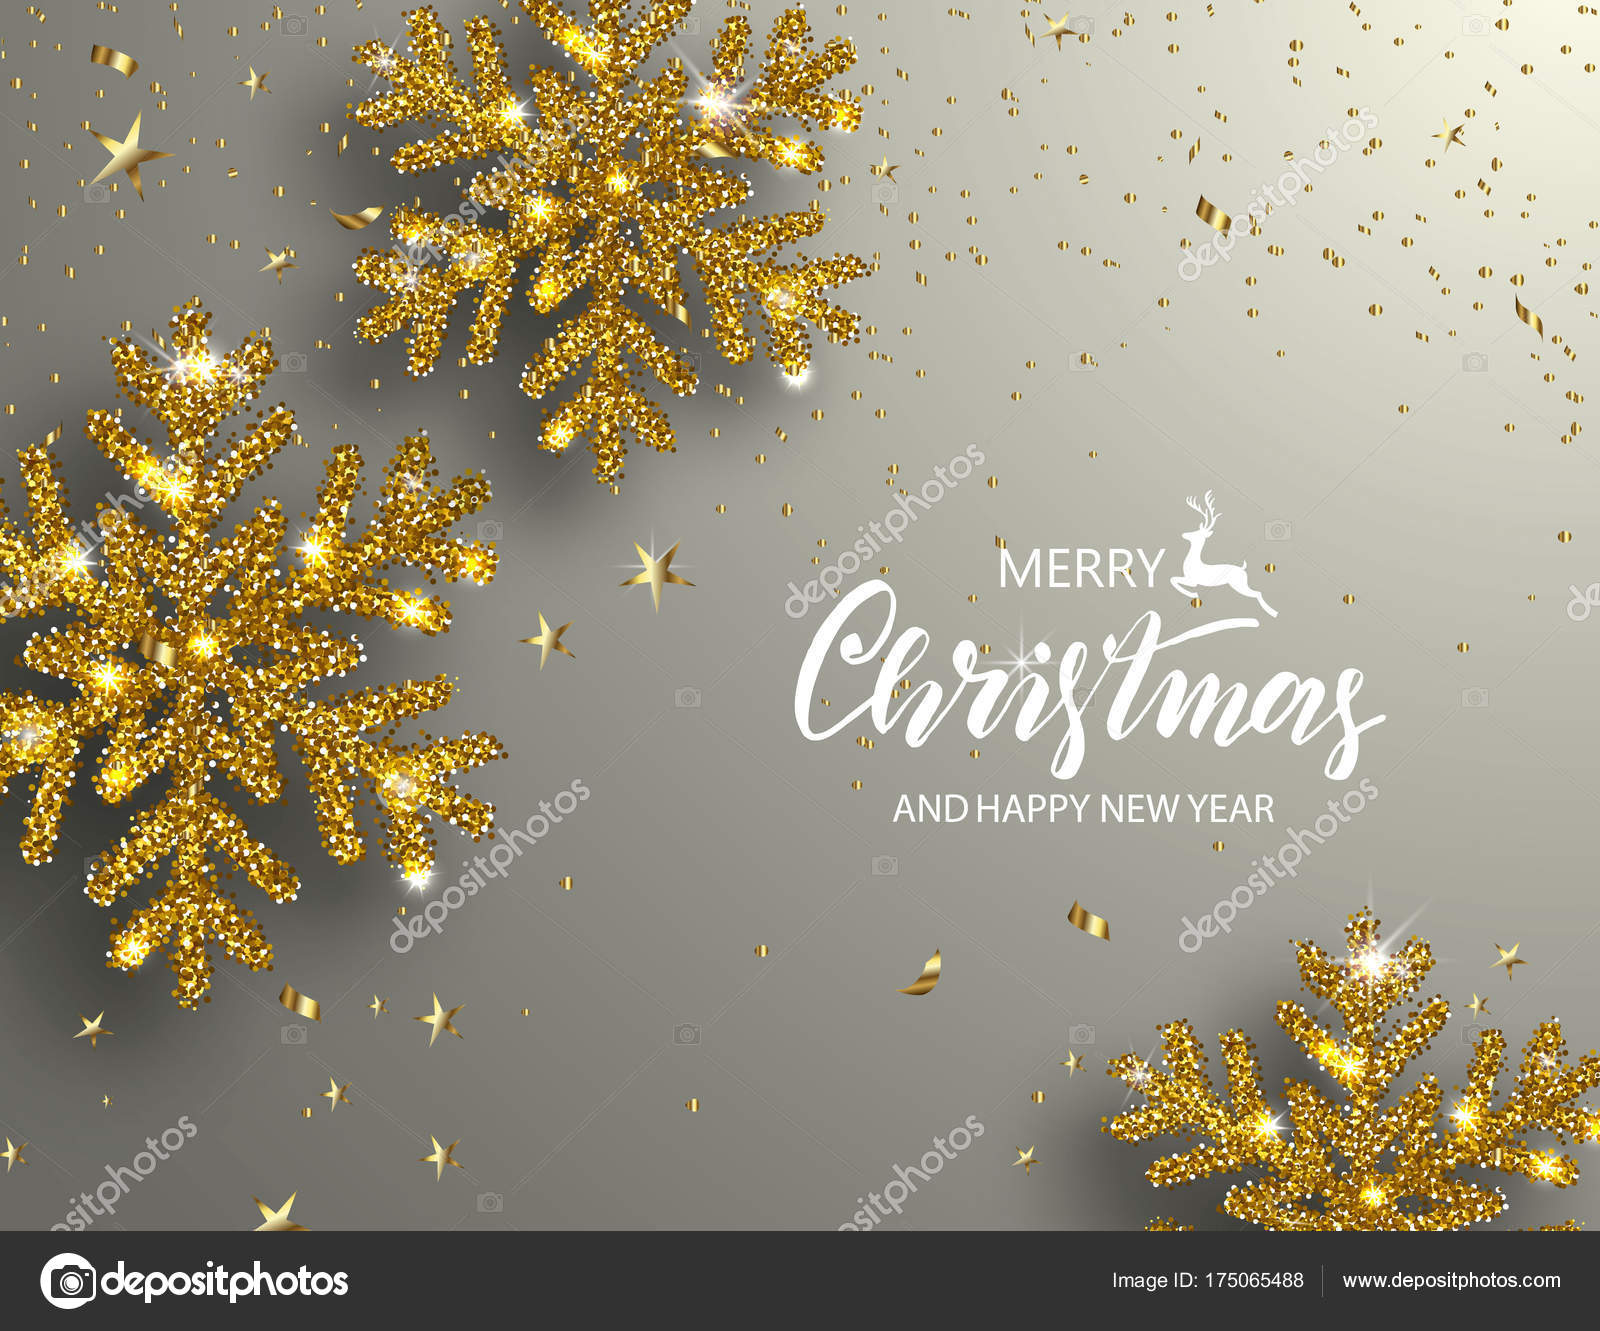 Elegant Christmas Background Hd.Elegant Christmas Background With Shining Gold Snowflakes